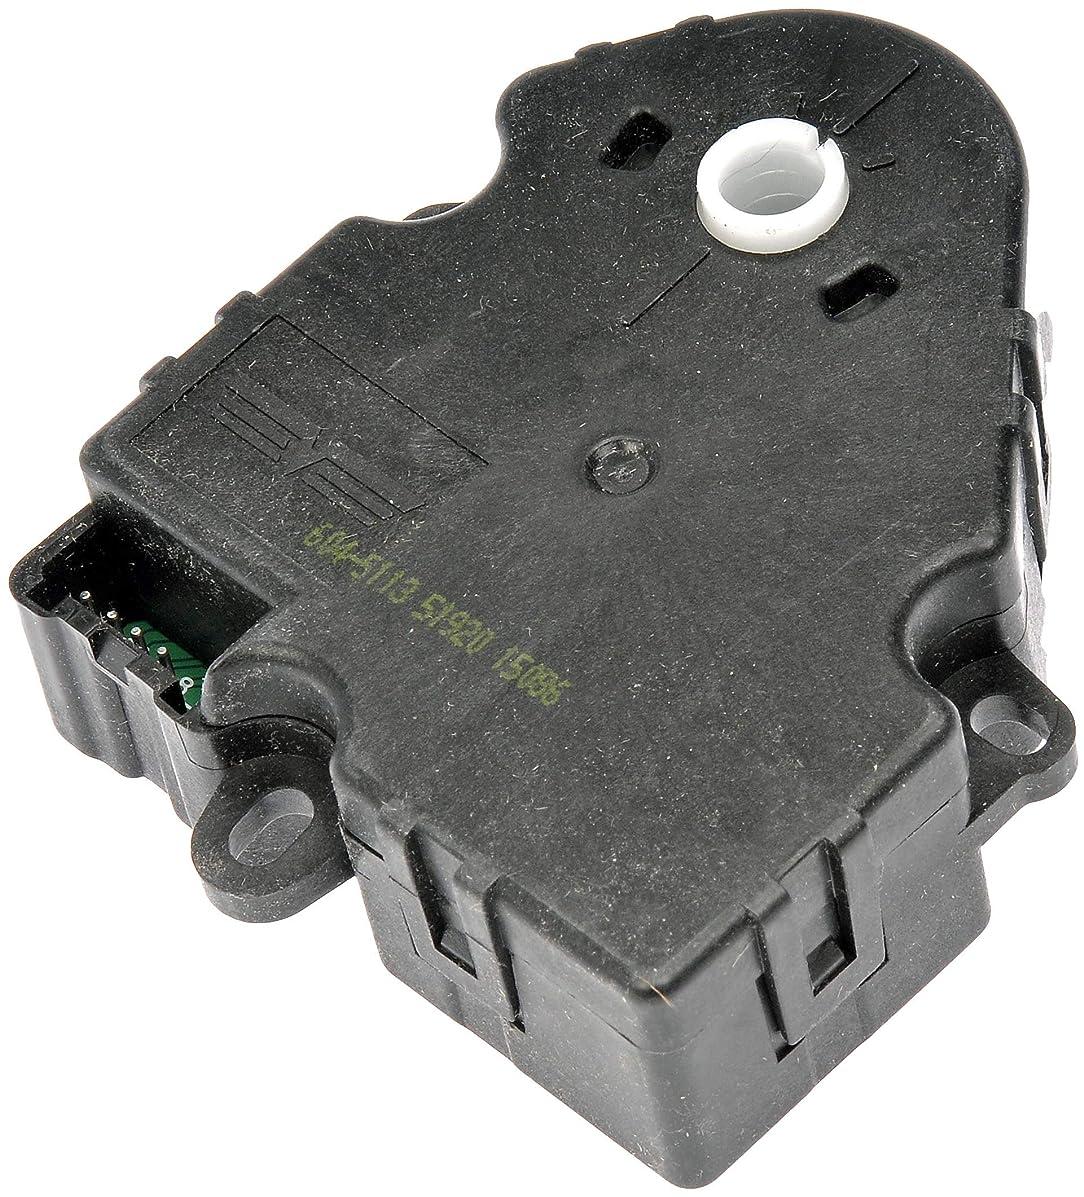 Dorman 604-5113 HVAC Heater Blend Door Actuator for Select Peterbilt Trucks